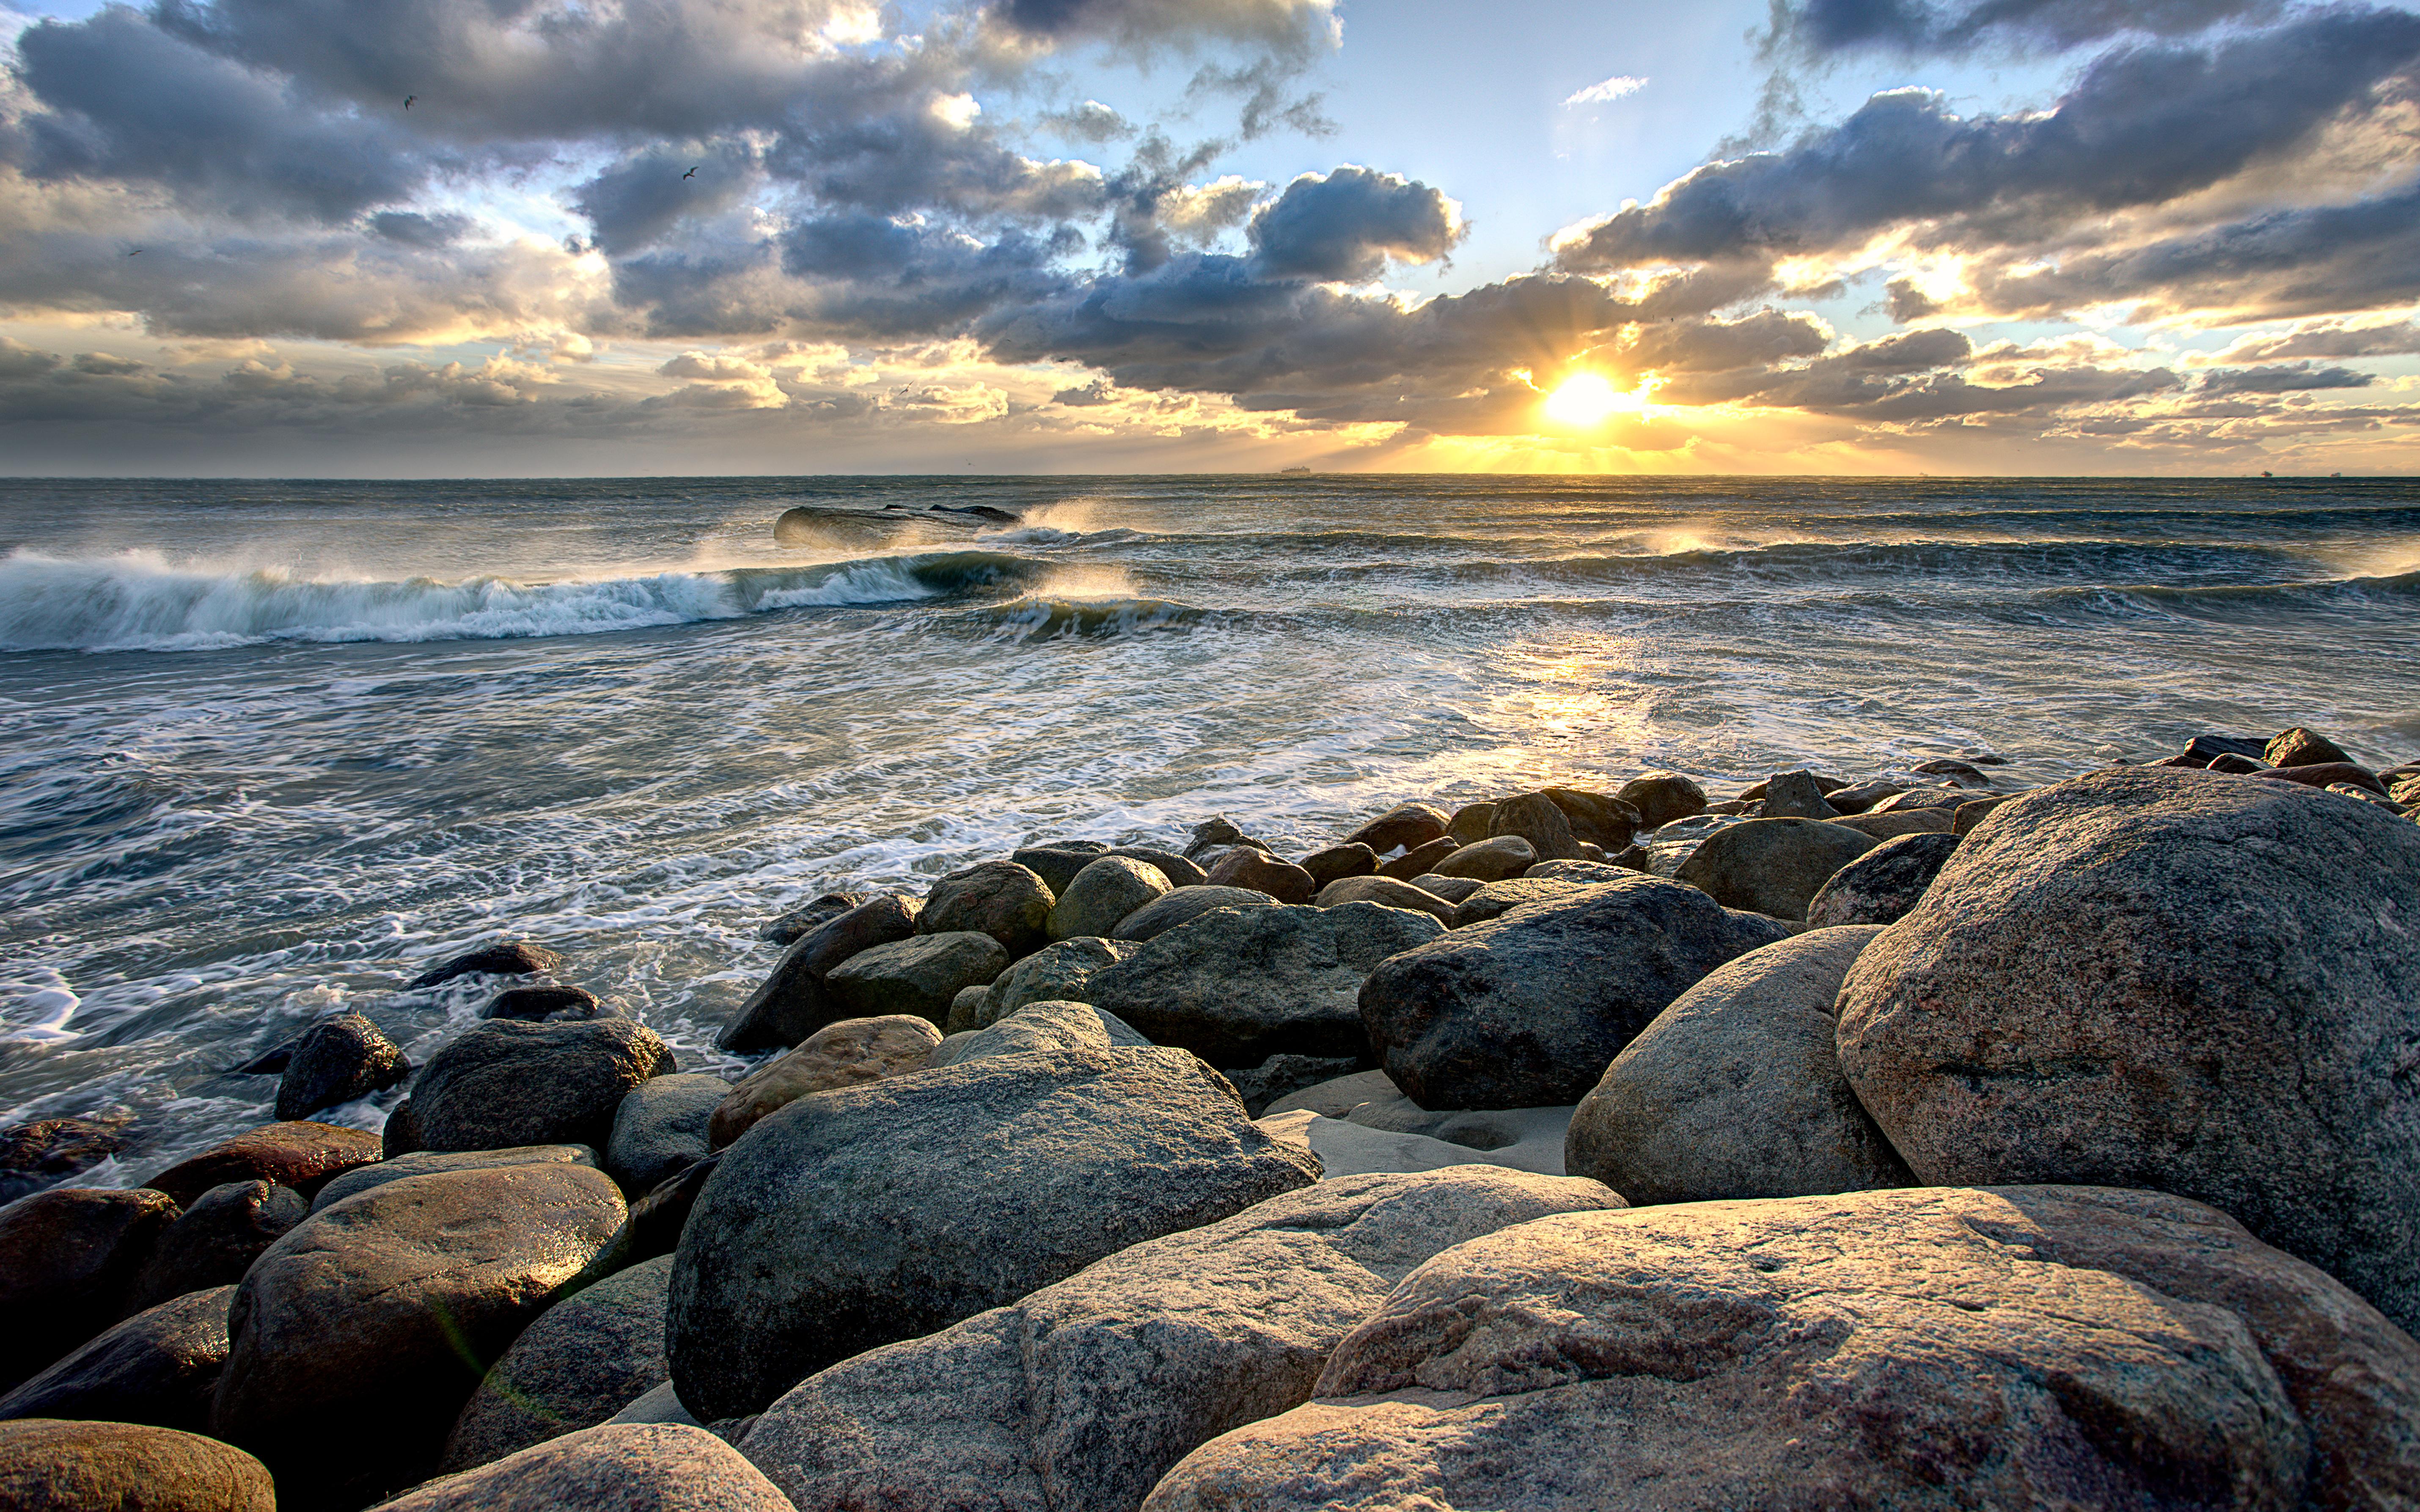 картинки пейзаж с морем